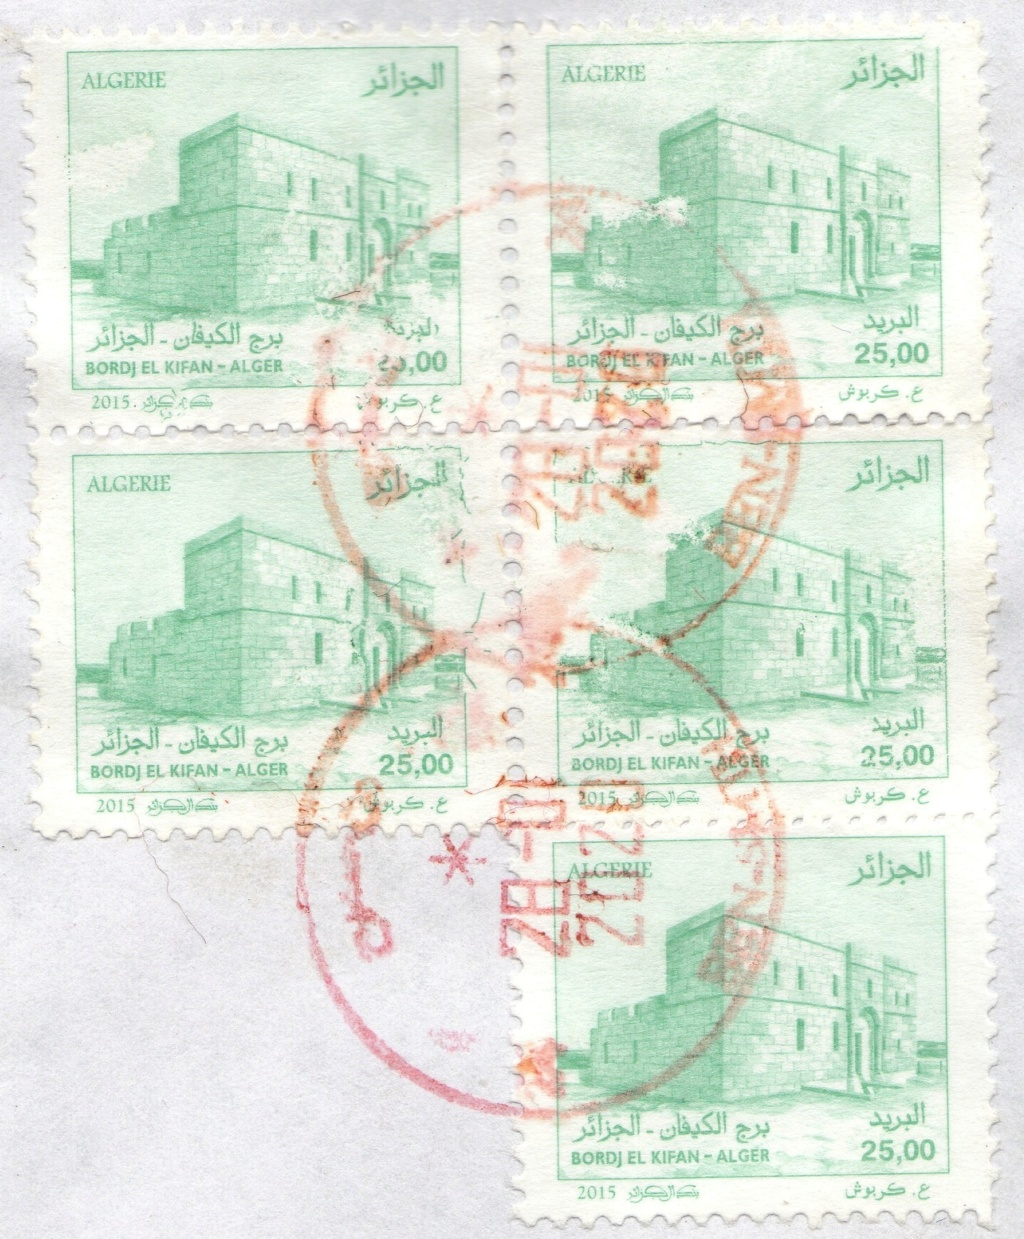 Variétés : BORDJ EL-KIFFAN - Page 2 Img37010